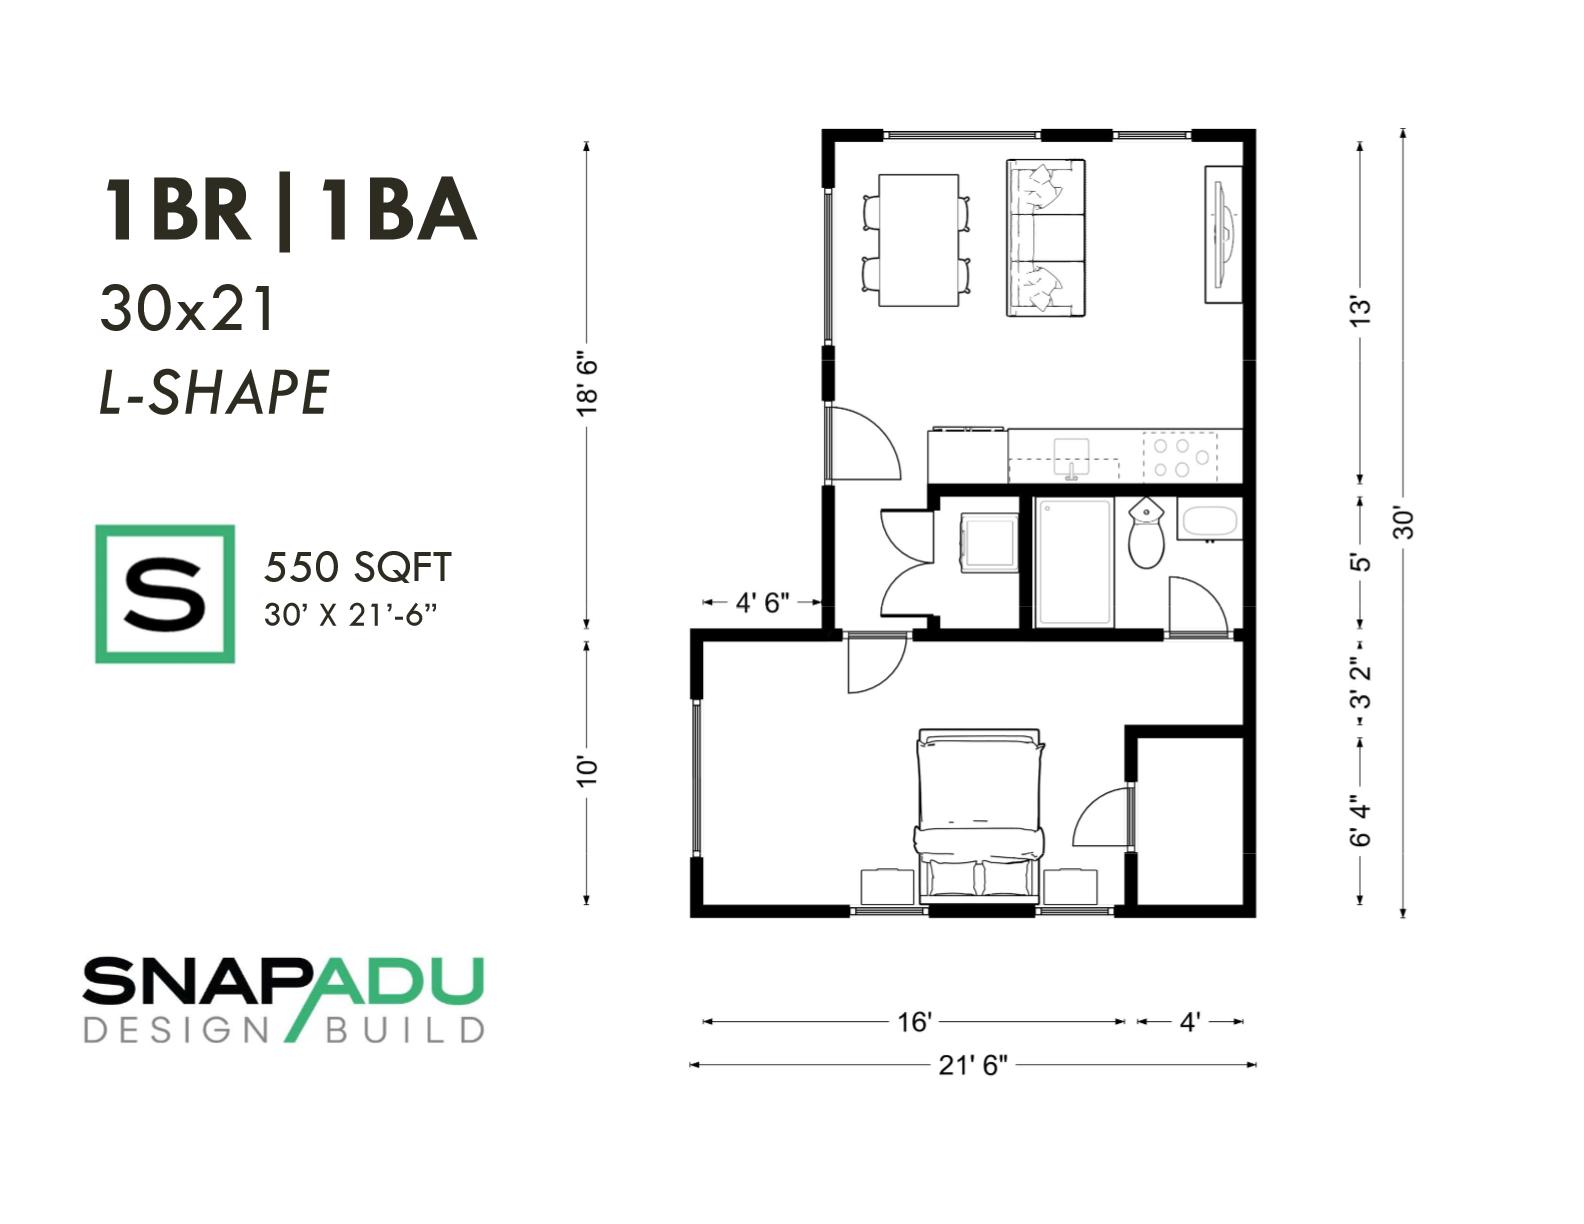 1BR 1BA 550 sqft 30x21 L-SHAPE ADU floor plan